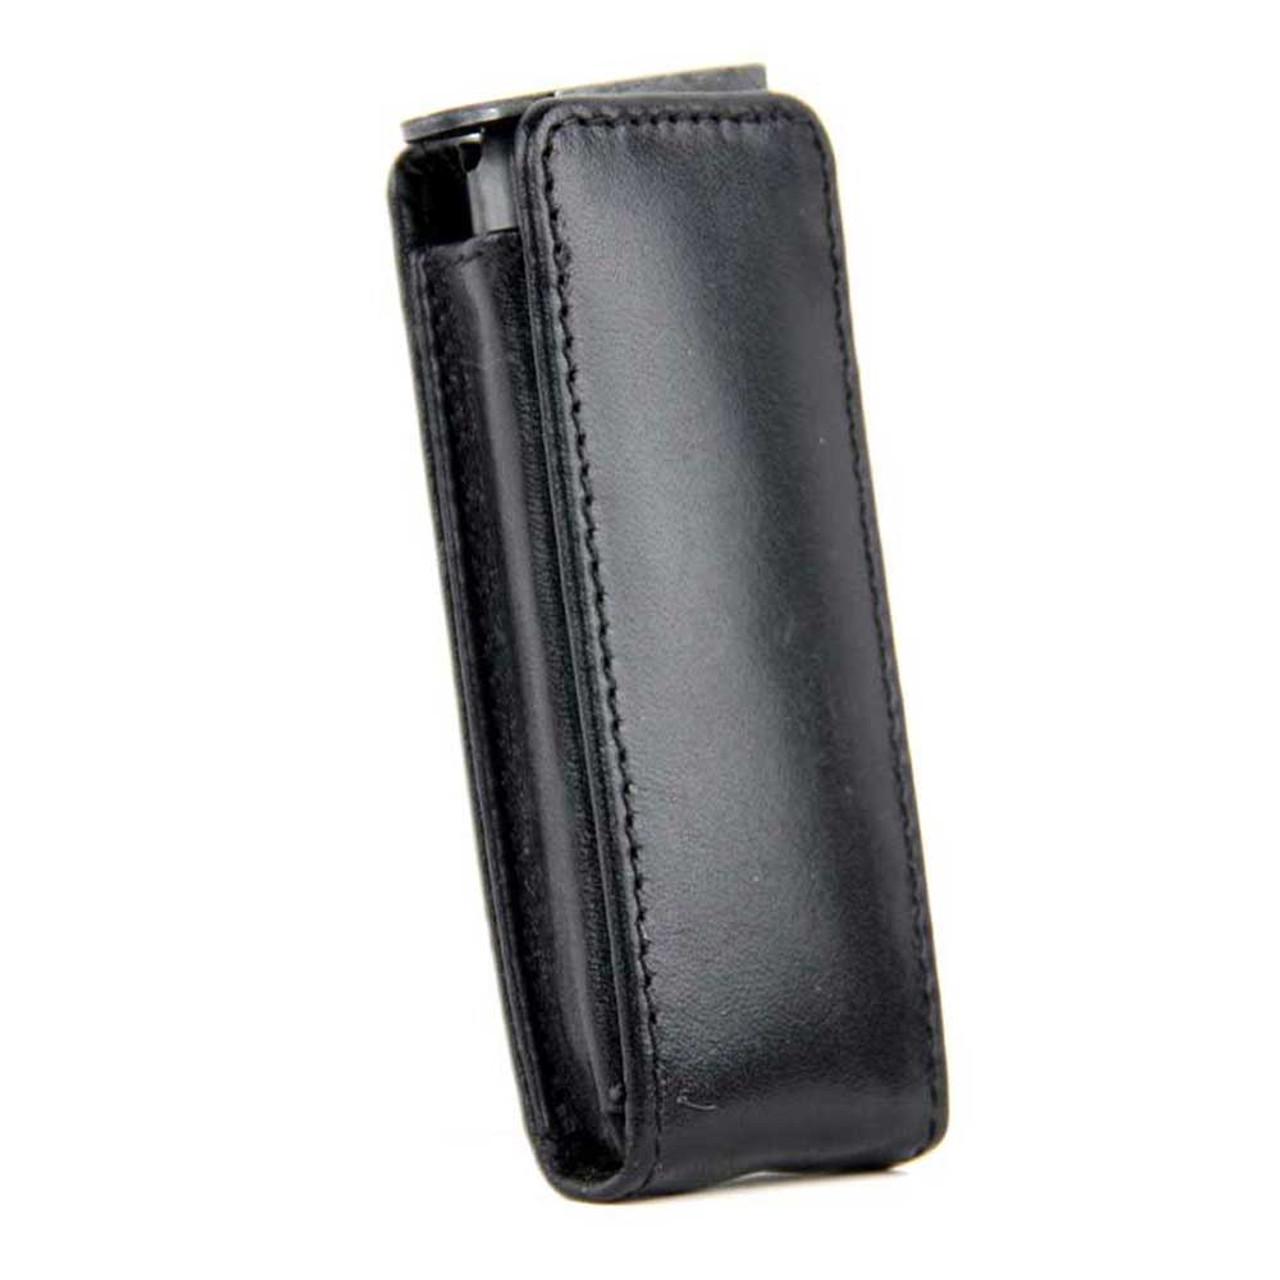 Masterpiece Arms .32 Magazine Pocket Protector